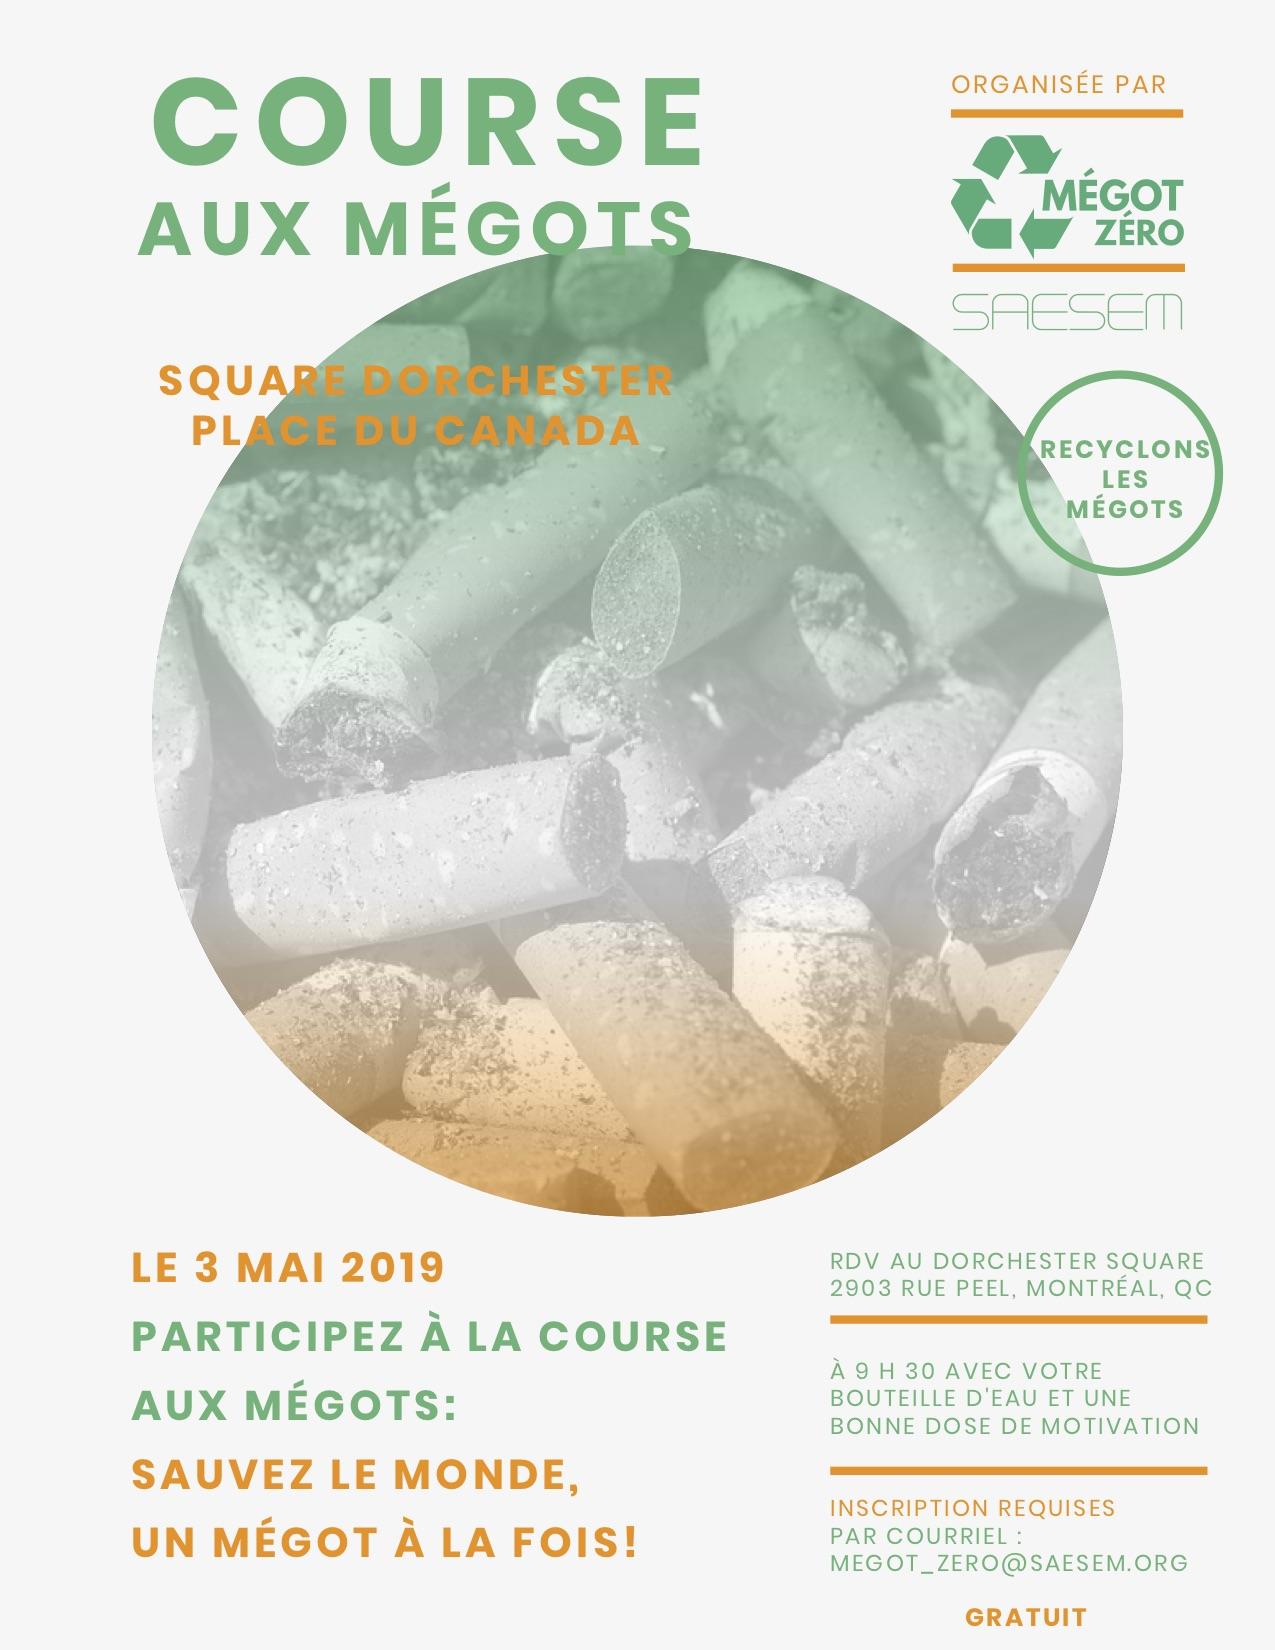 course-aux-mégots-sd-pdc.jpg